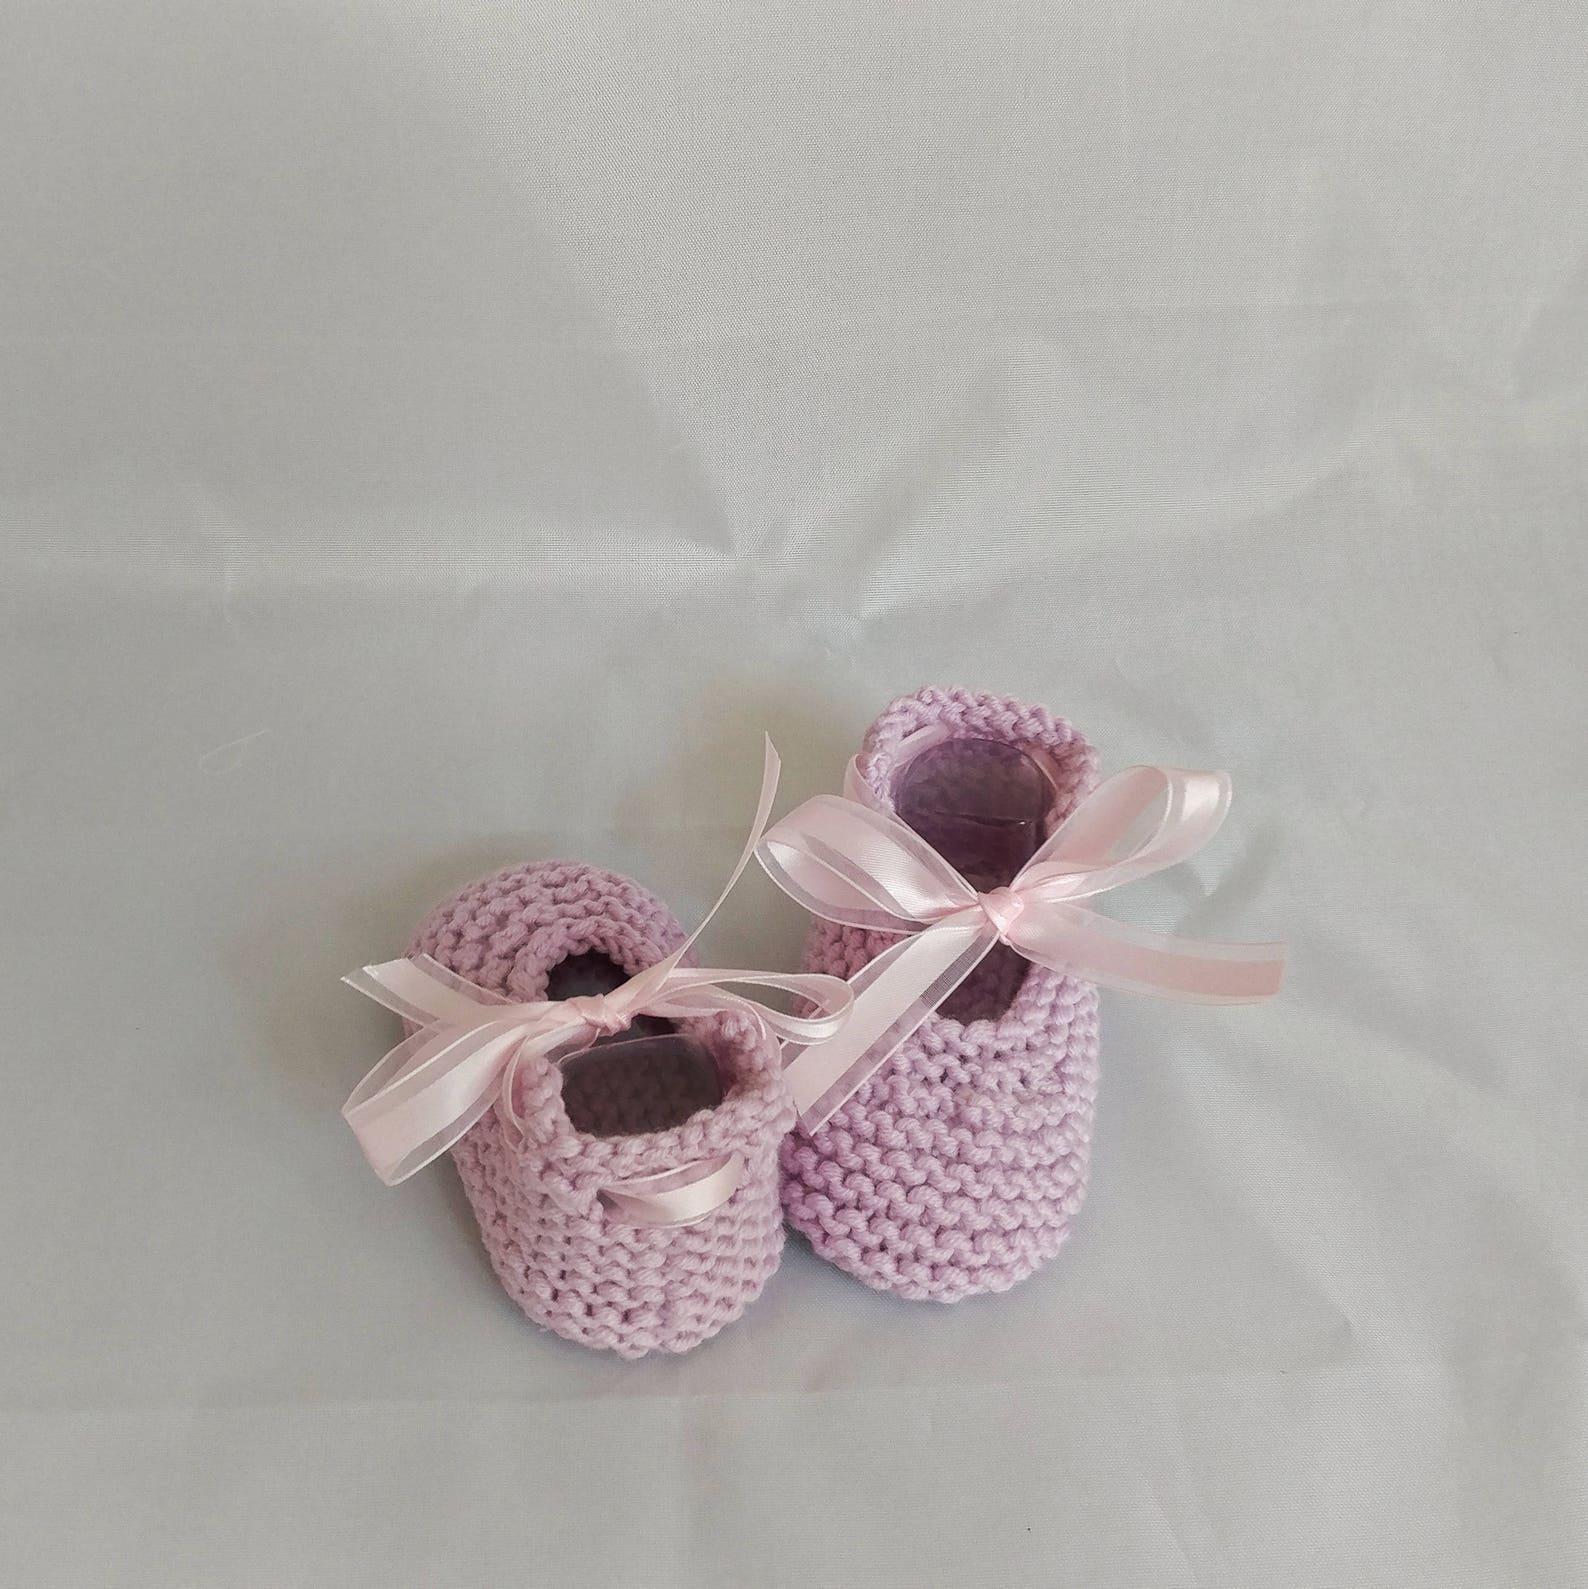 baby booties, newborn booties, newborn knit booties, handmade booties, baby, ballet slippers, booties with pom pom, baby knitted